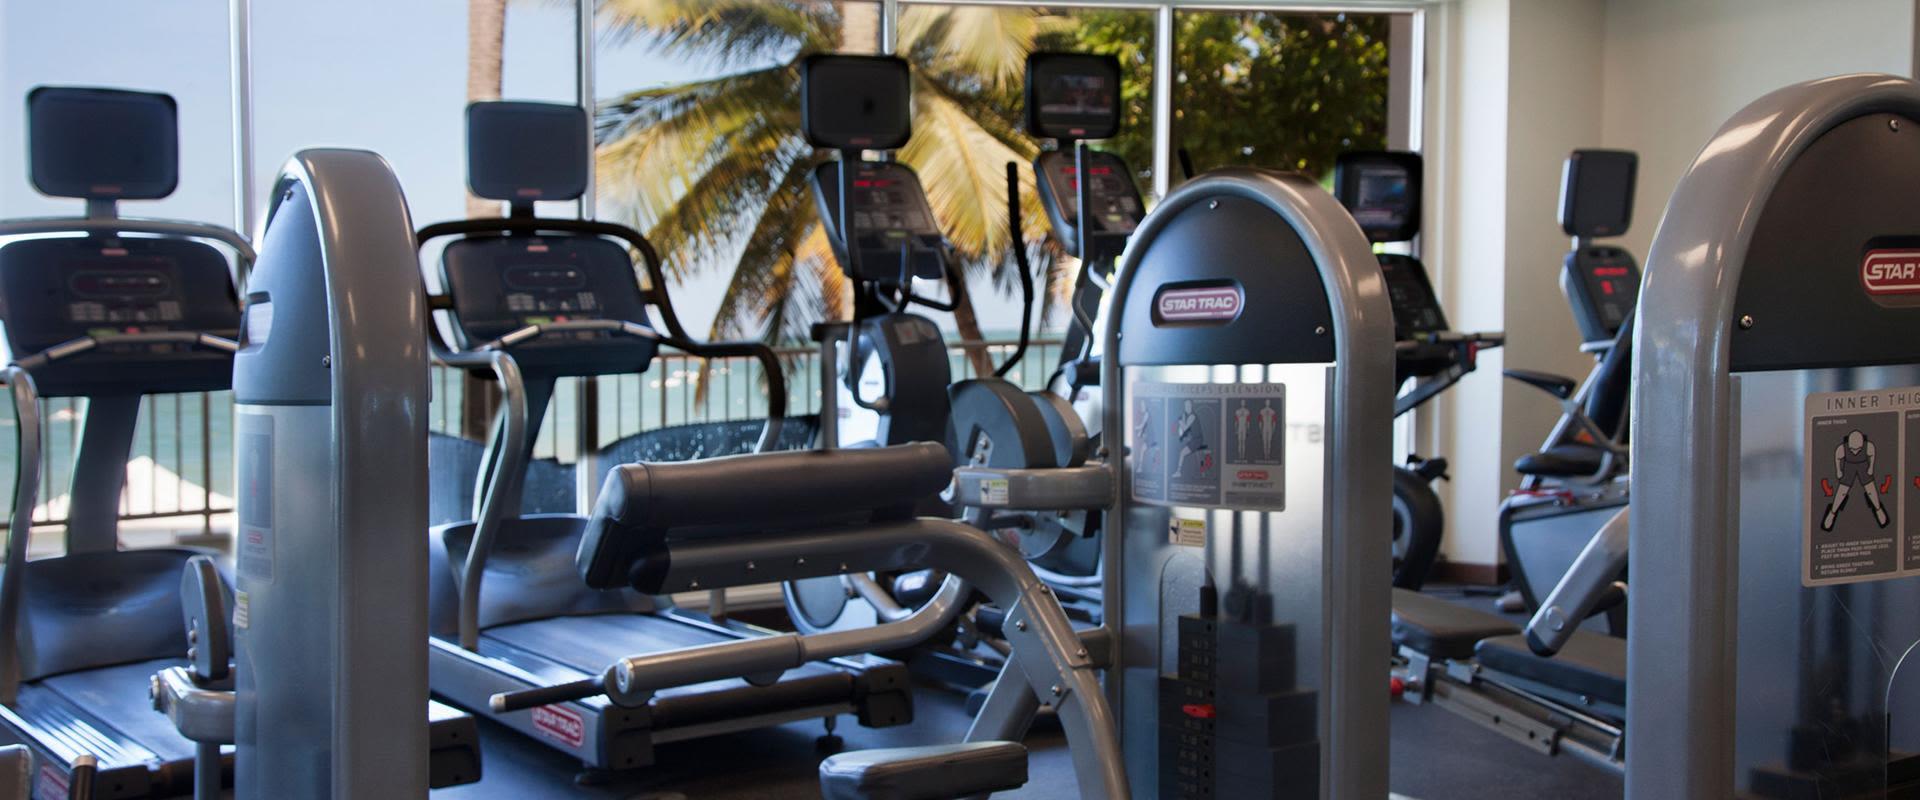 San Juan Resort Fitness Center